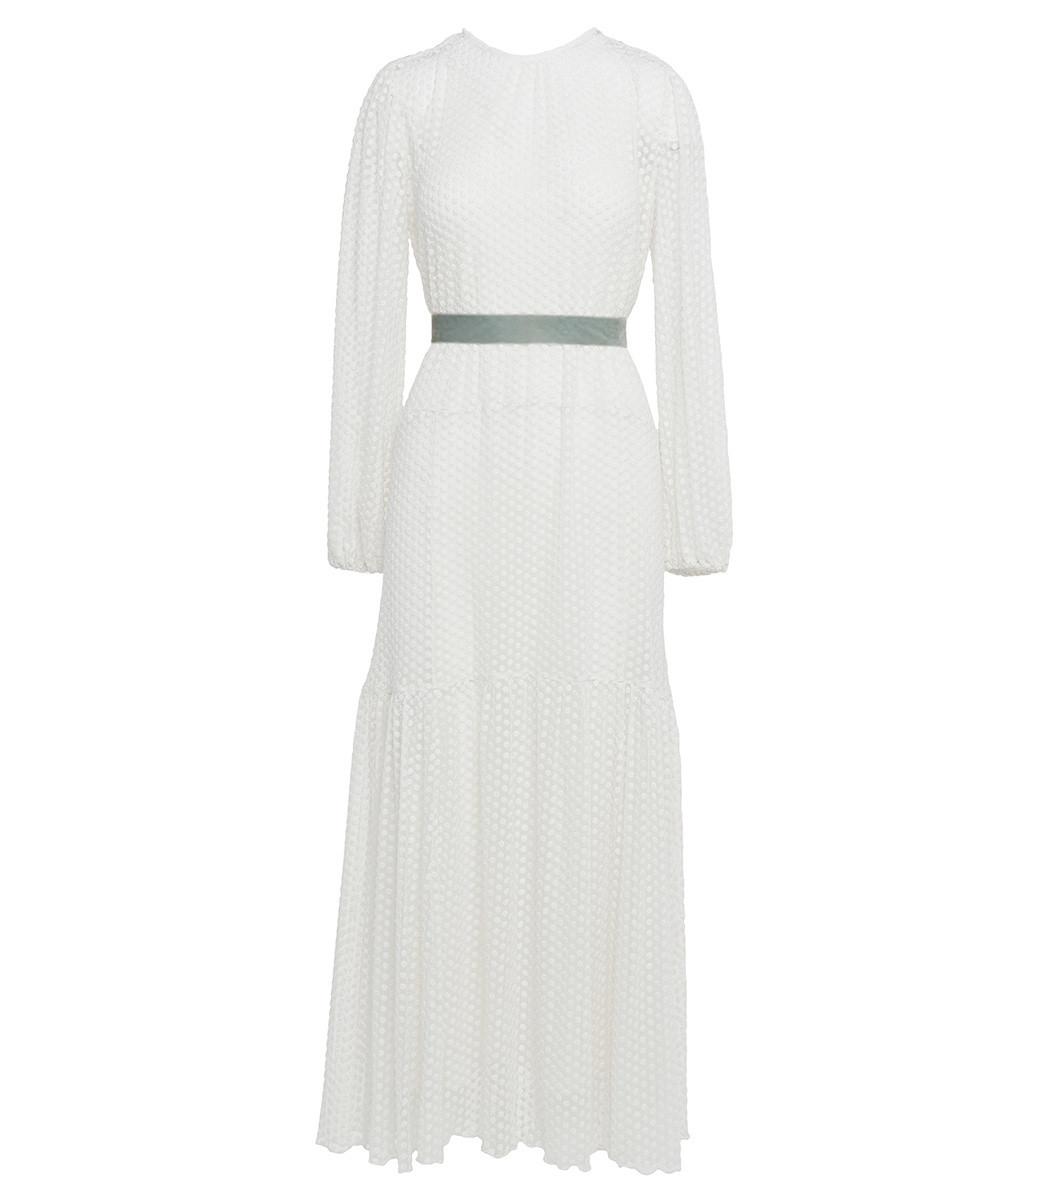 Ivory Tulle Dresses